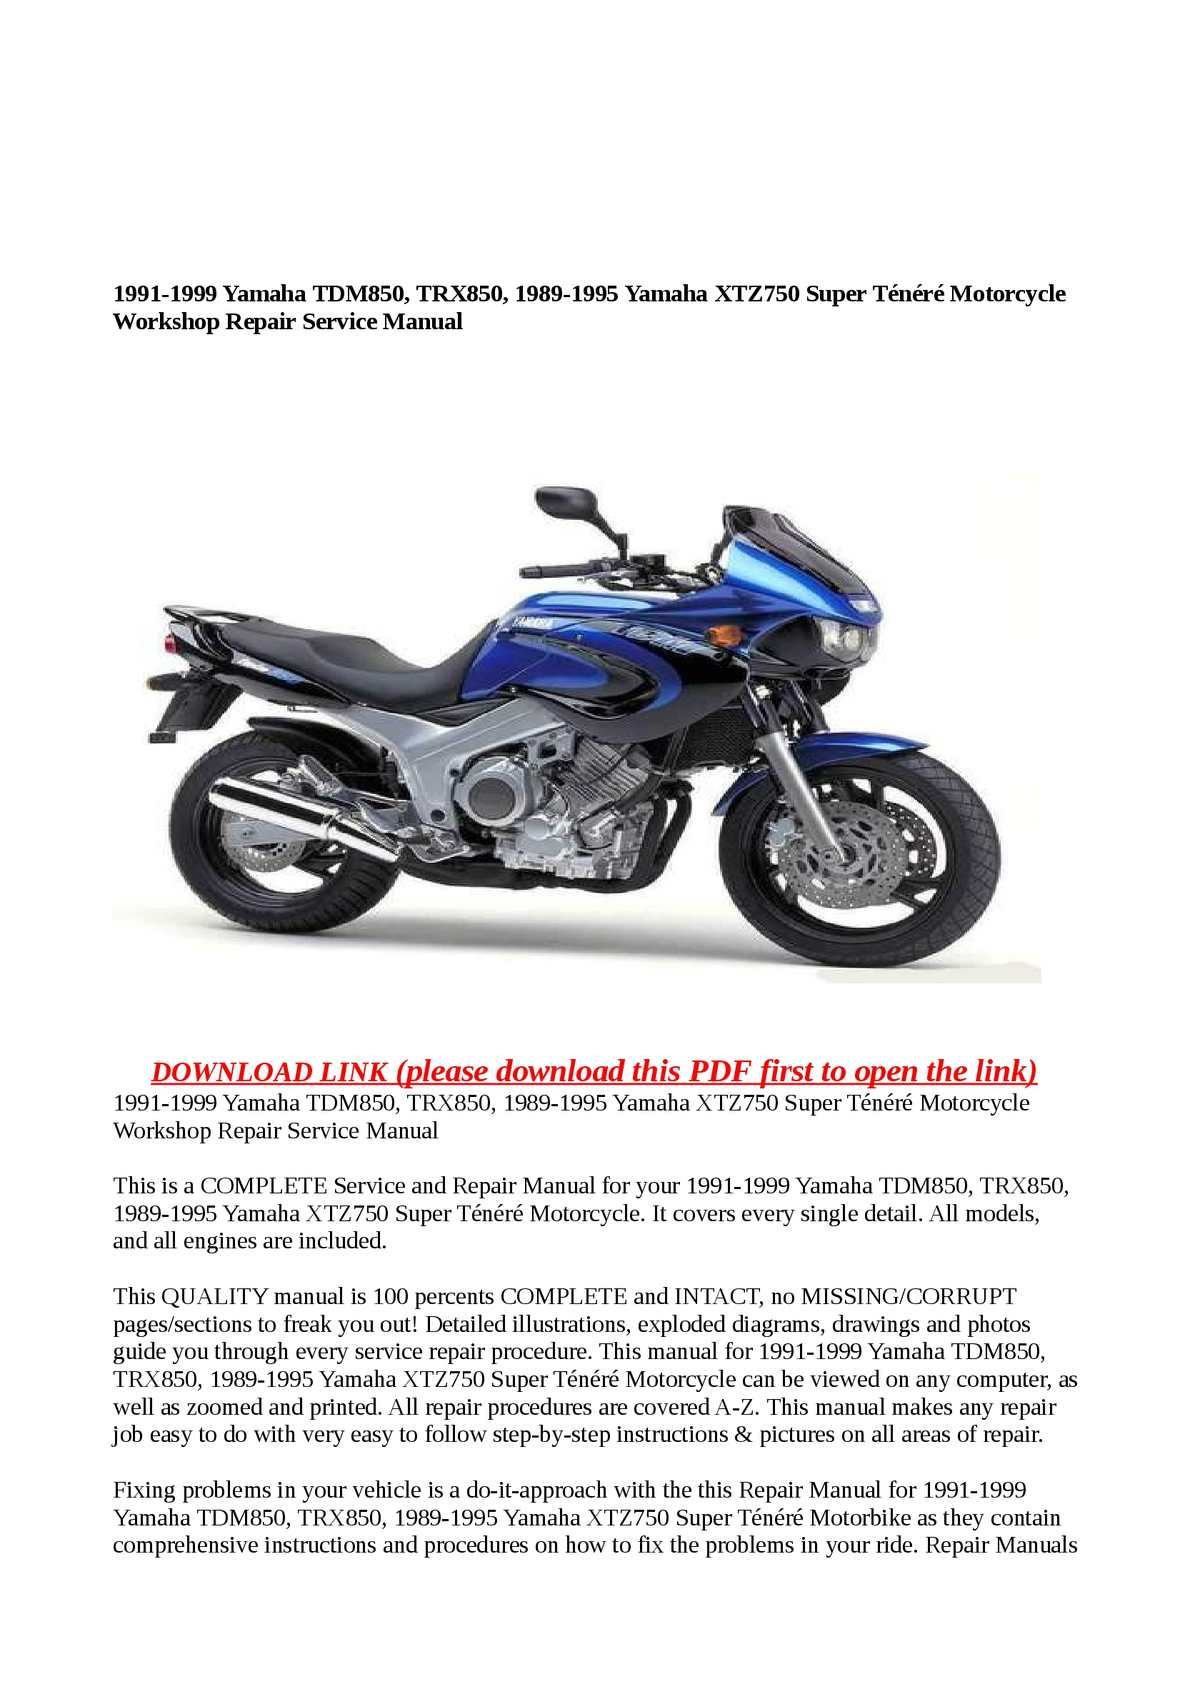 kawasaki g3tr g3ss wiring Array - cbz service manuals rh cbz service manuals  elzplorers de array yamaha motorcycle ...